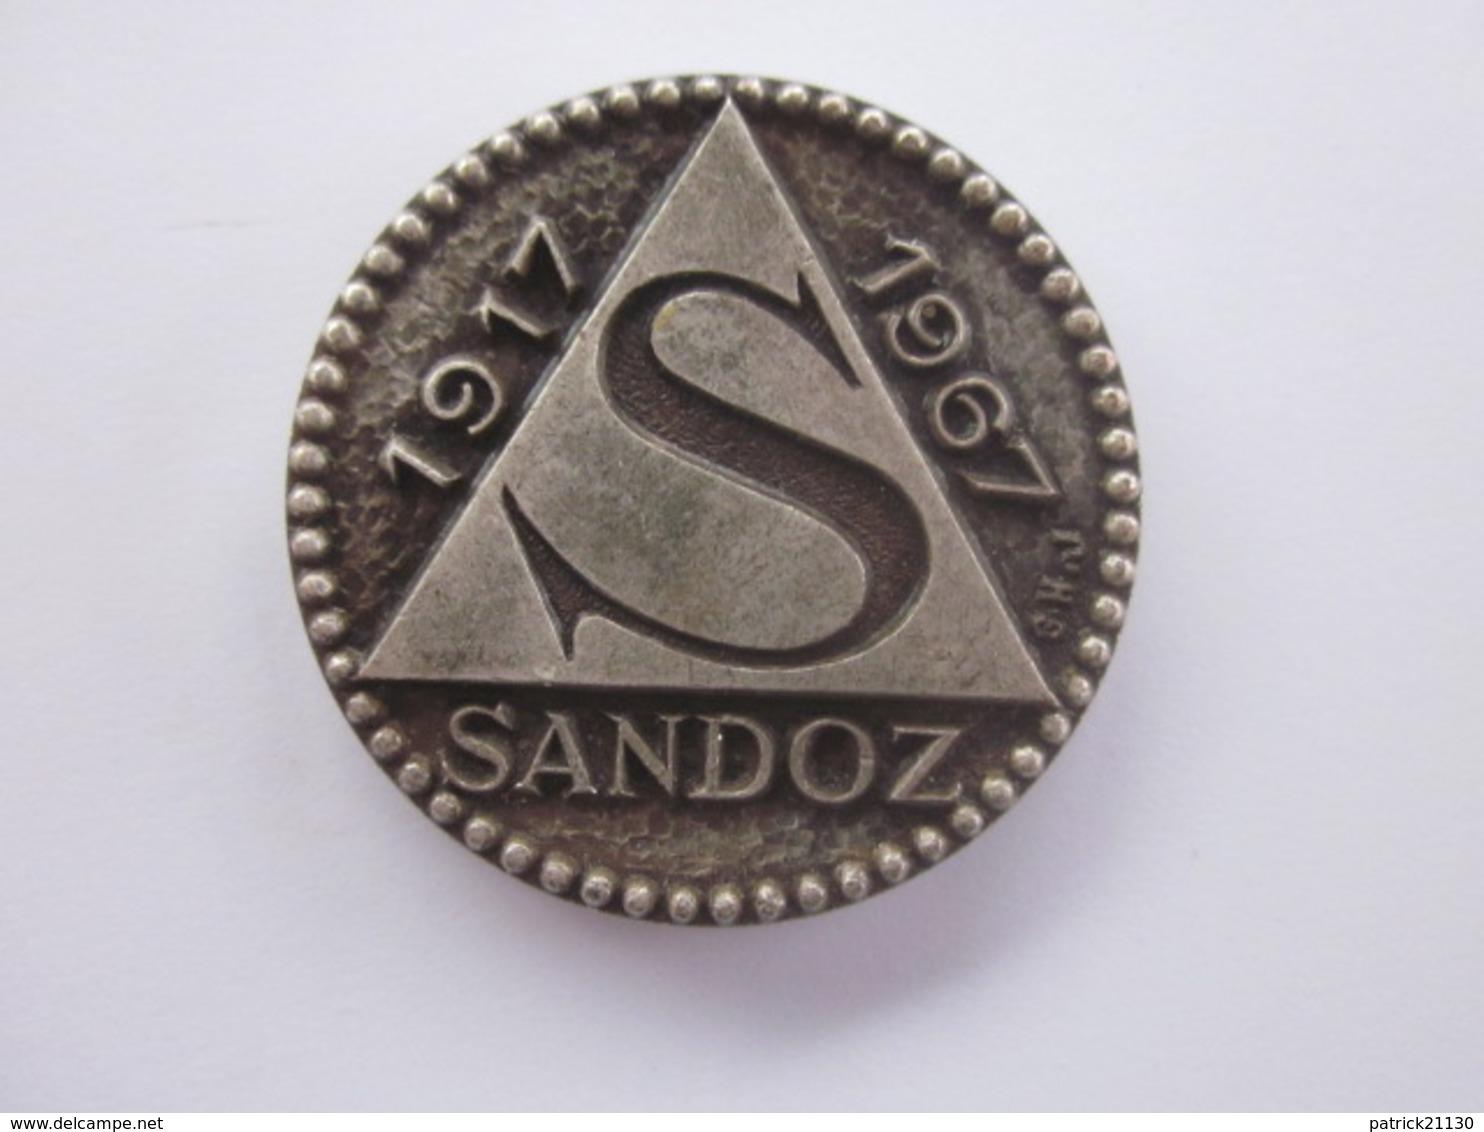 MEDAILLE LABORATOIRES SANDOZ 1917 1967 MEDECINE OU PHARMACIE - Professionals / Firms